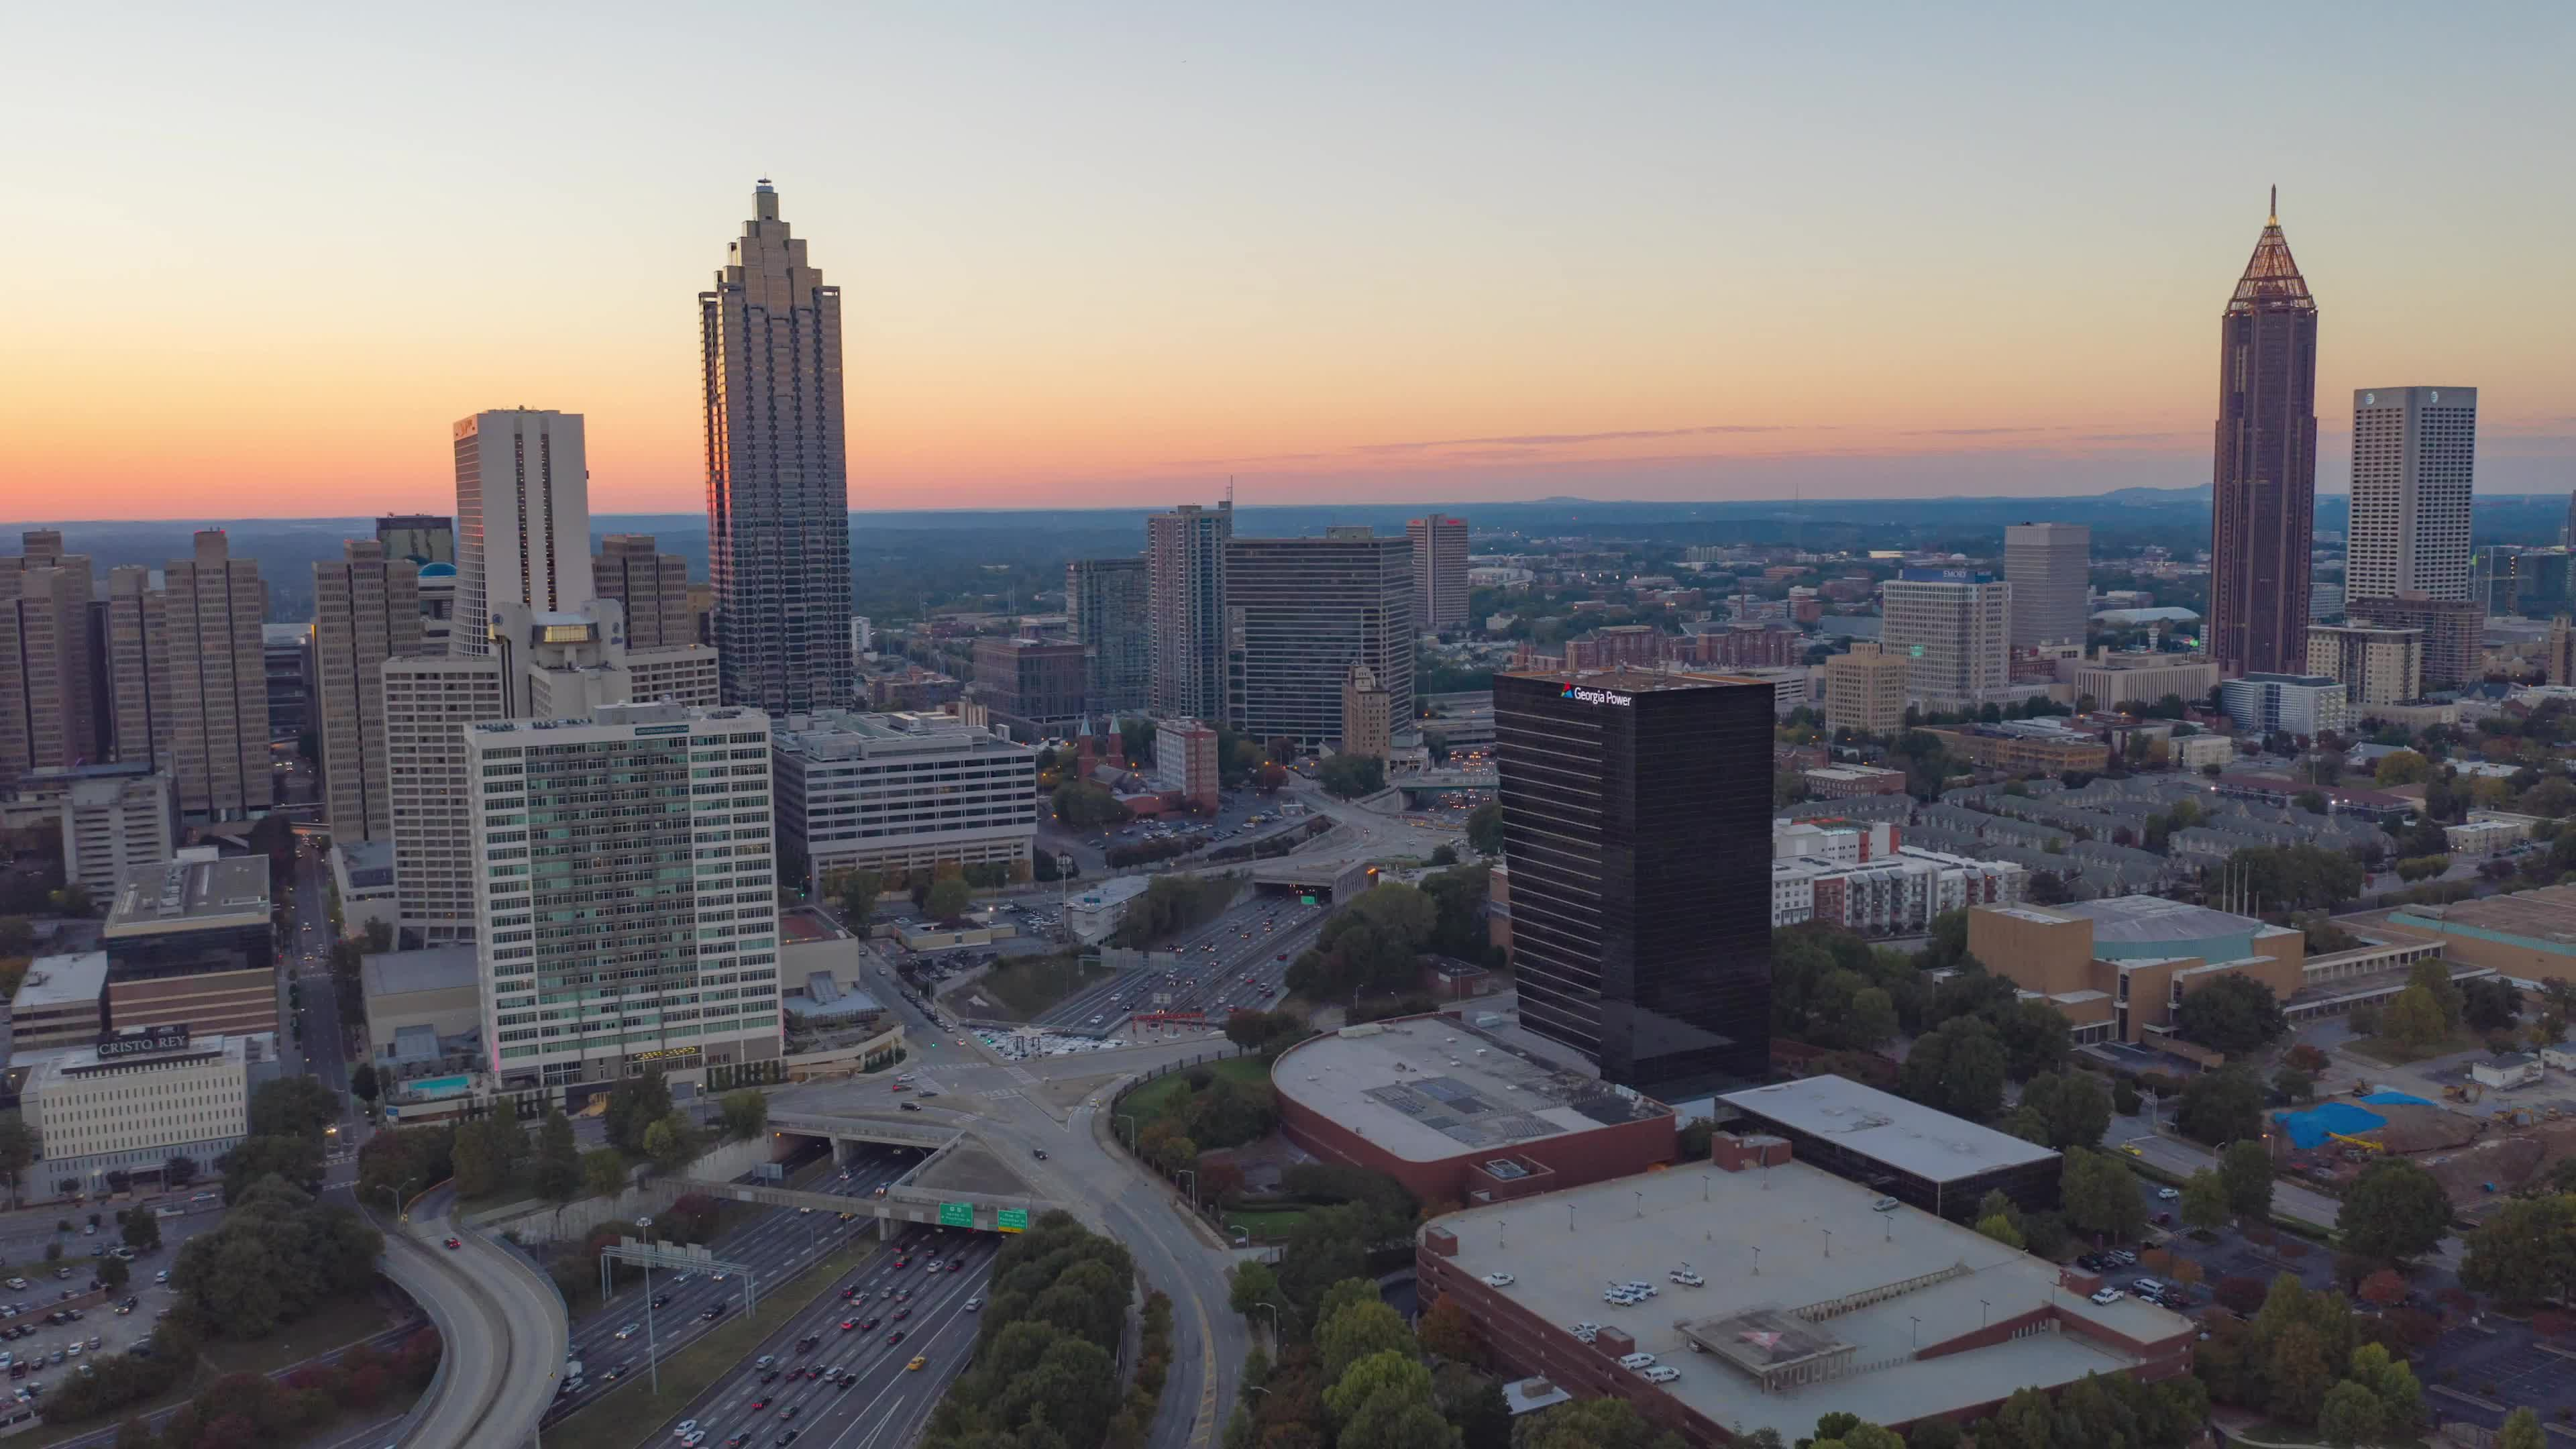 Atlanta, Hyperlapse, Mavic 2, Mavic 2 Pro, Atlanta Hyperlapse GIFs